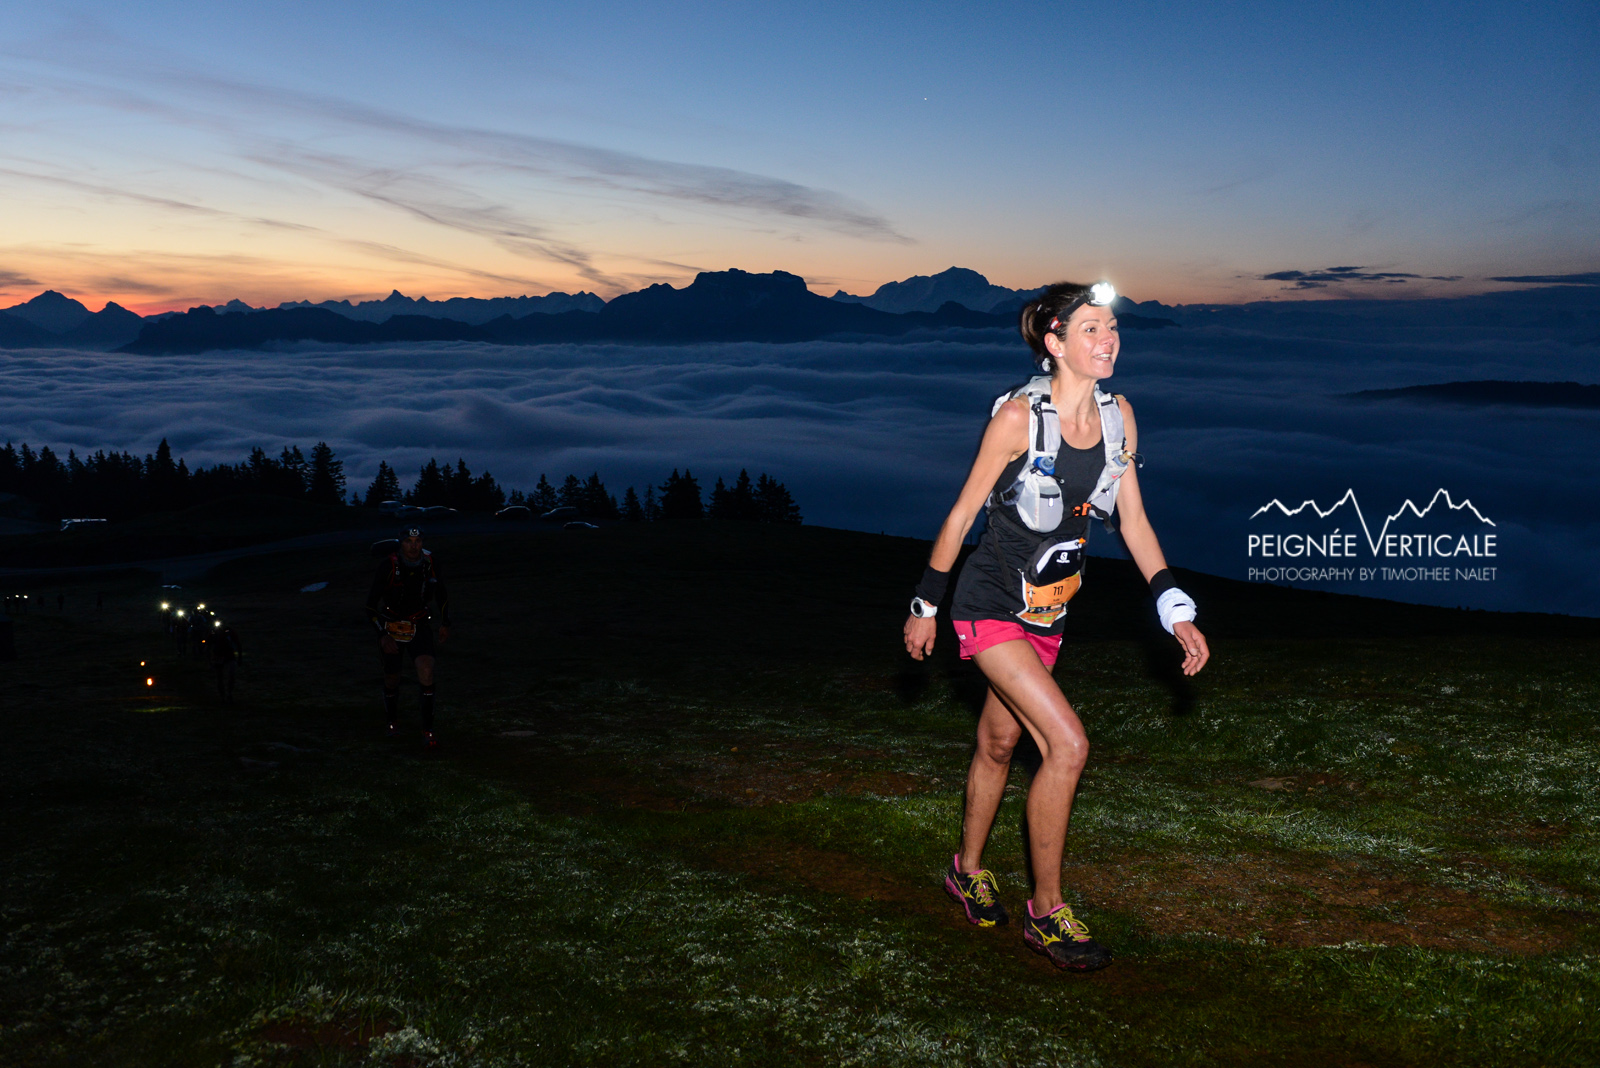 MaxiRace-Annecy-2014-Team-Hoka-Timothee-Nalet-0759.jpg